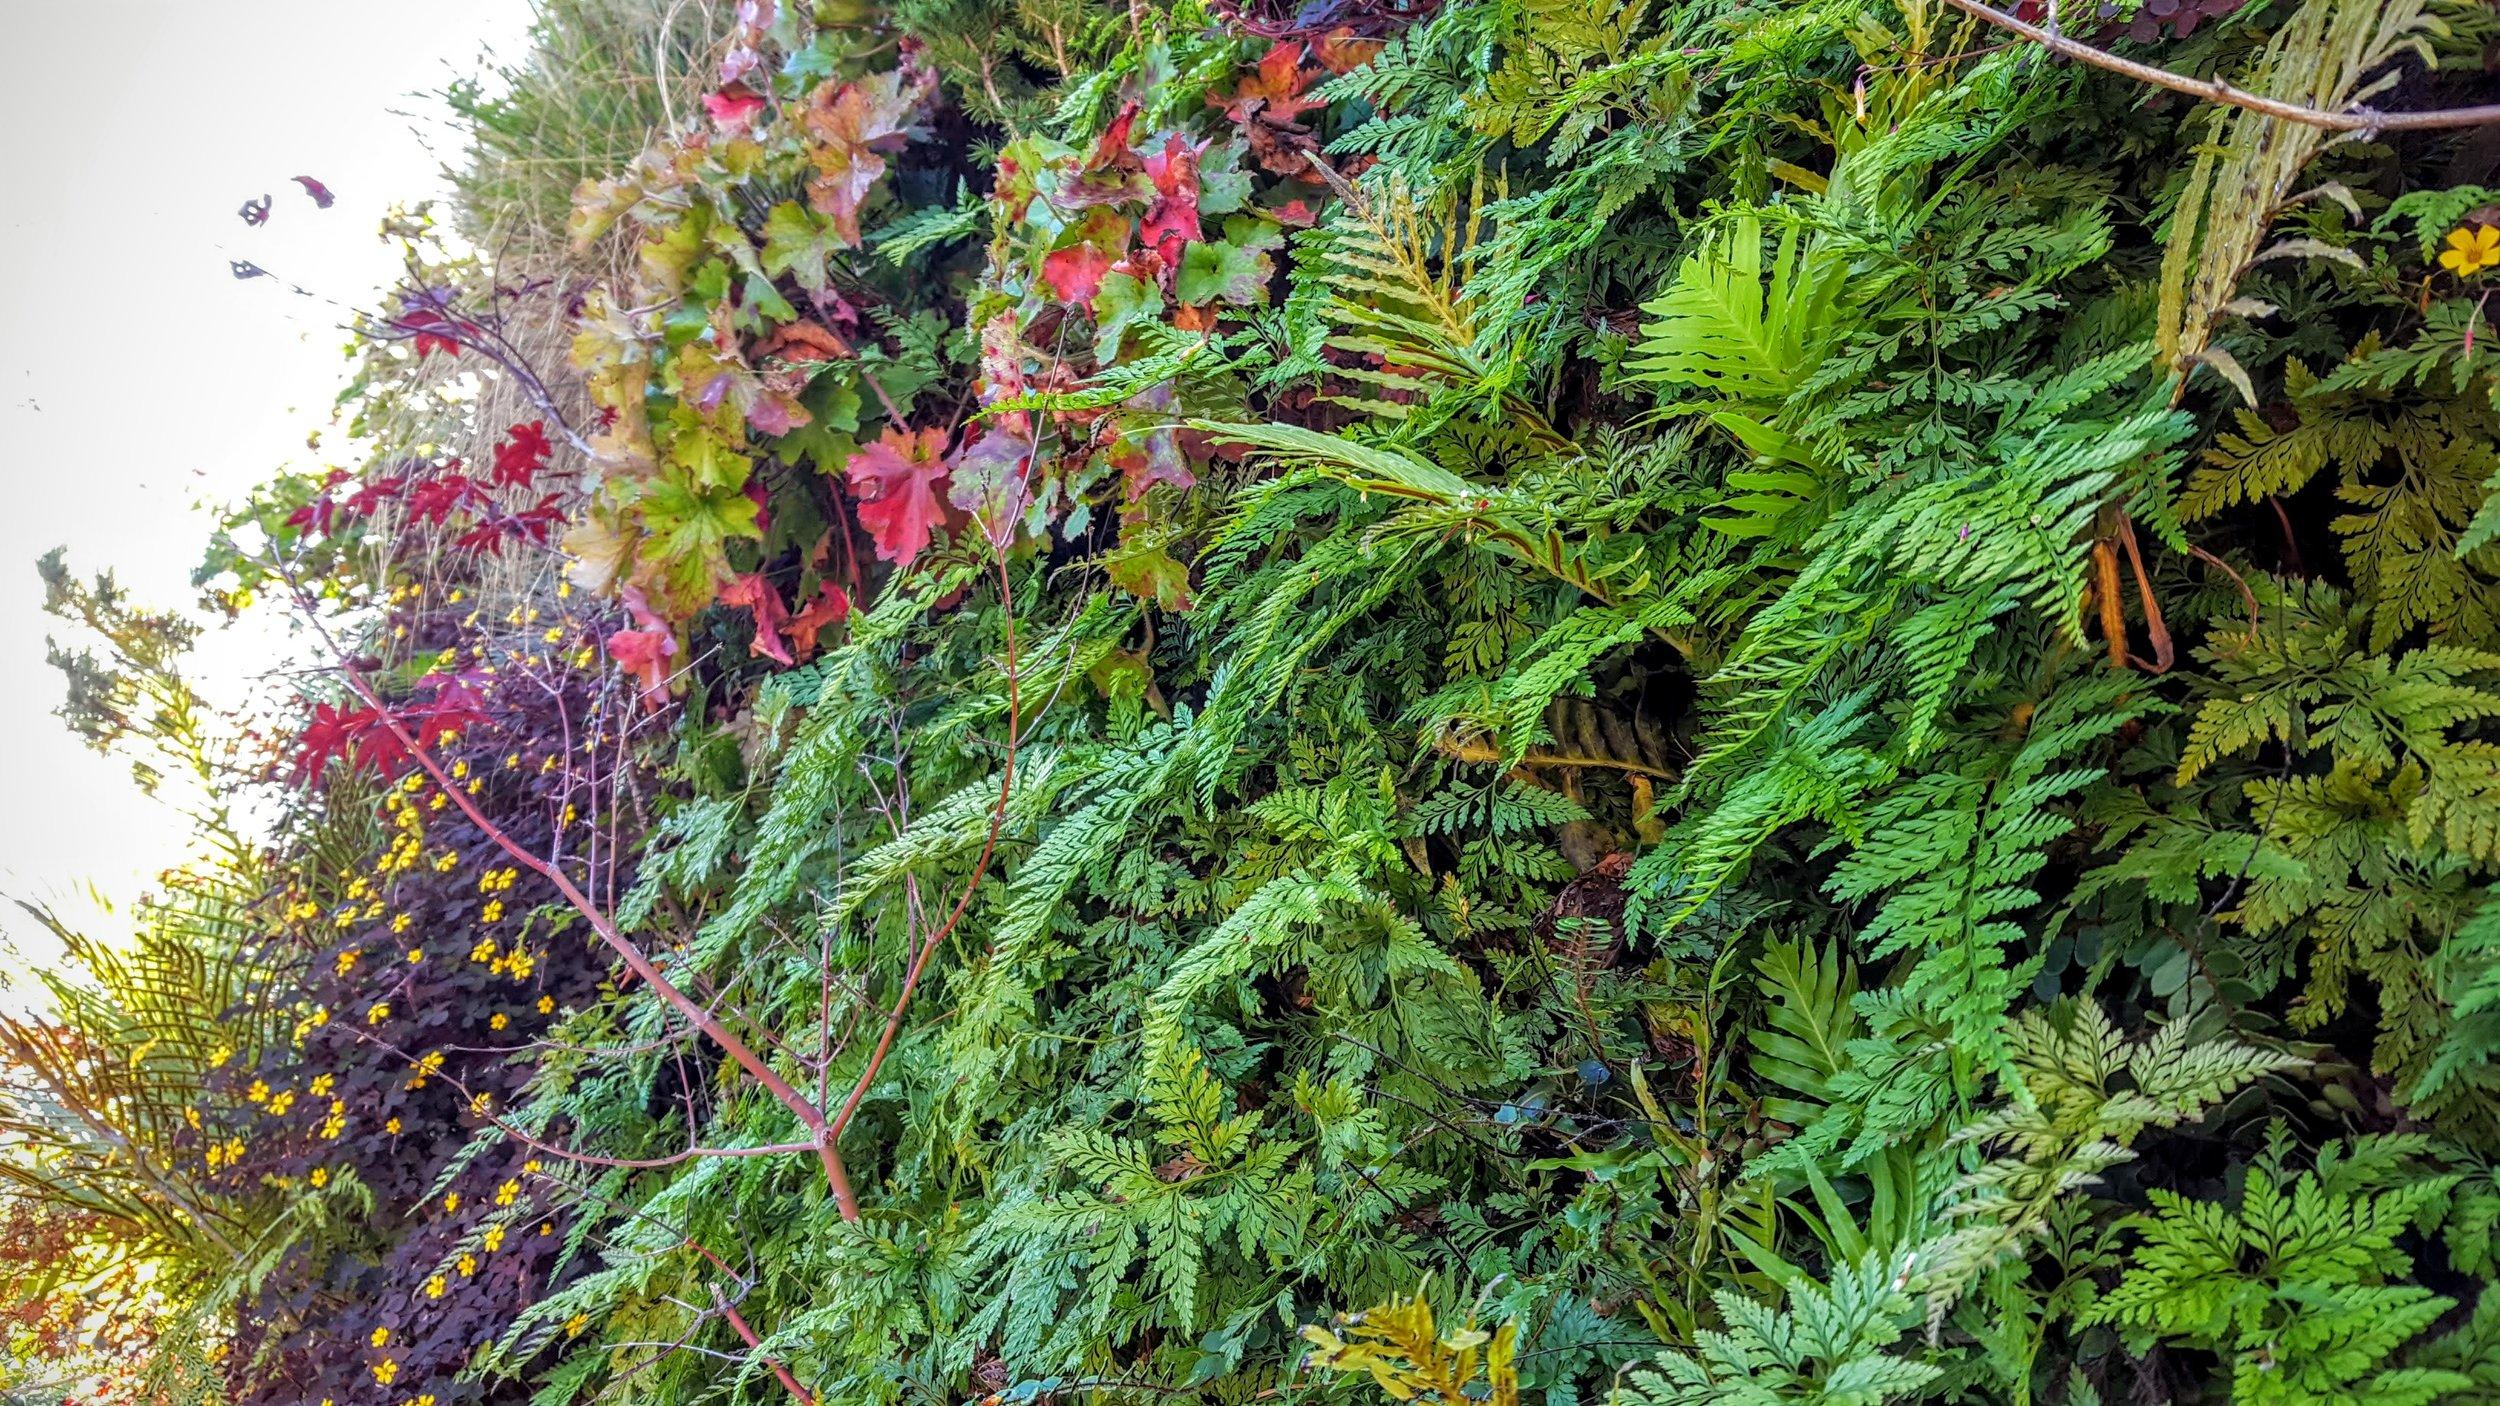 Florafelt-Pro-System-Vertical-Garden-Brandon-Pruett-Living-Walls-Living-Green-Design-20161108_092918.jpg